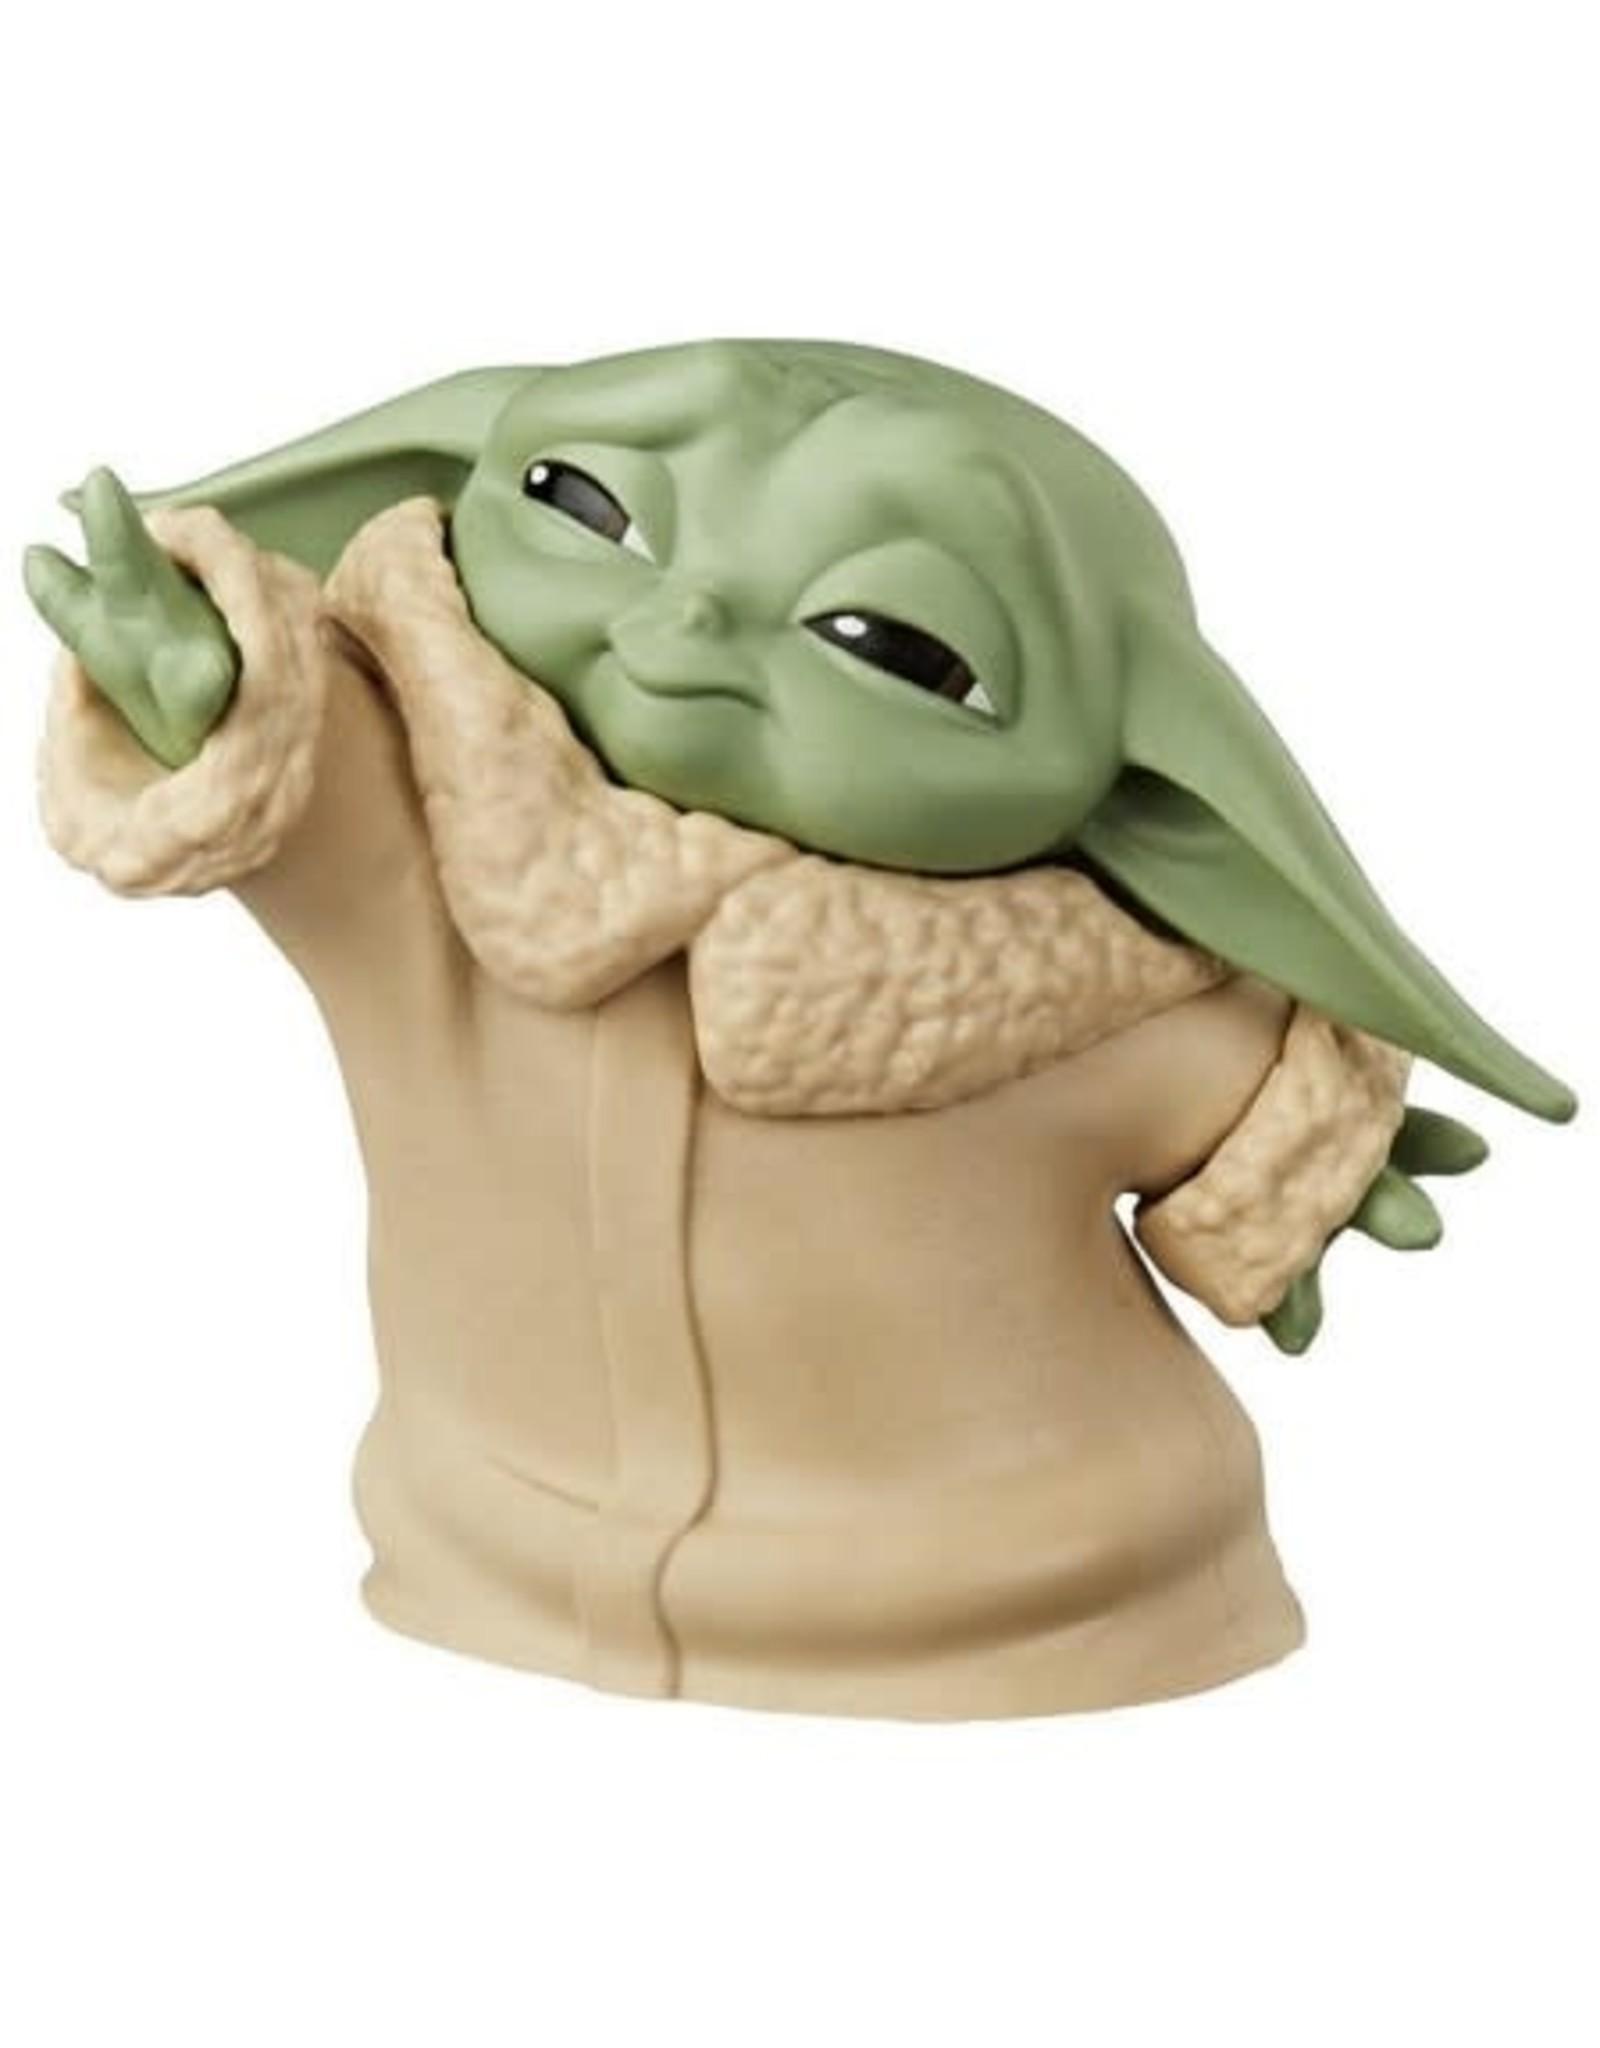 Hasbro Star Wars - Mandalorian the Child Bounty - Force